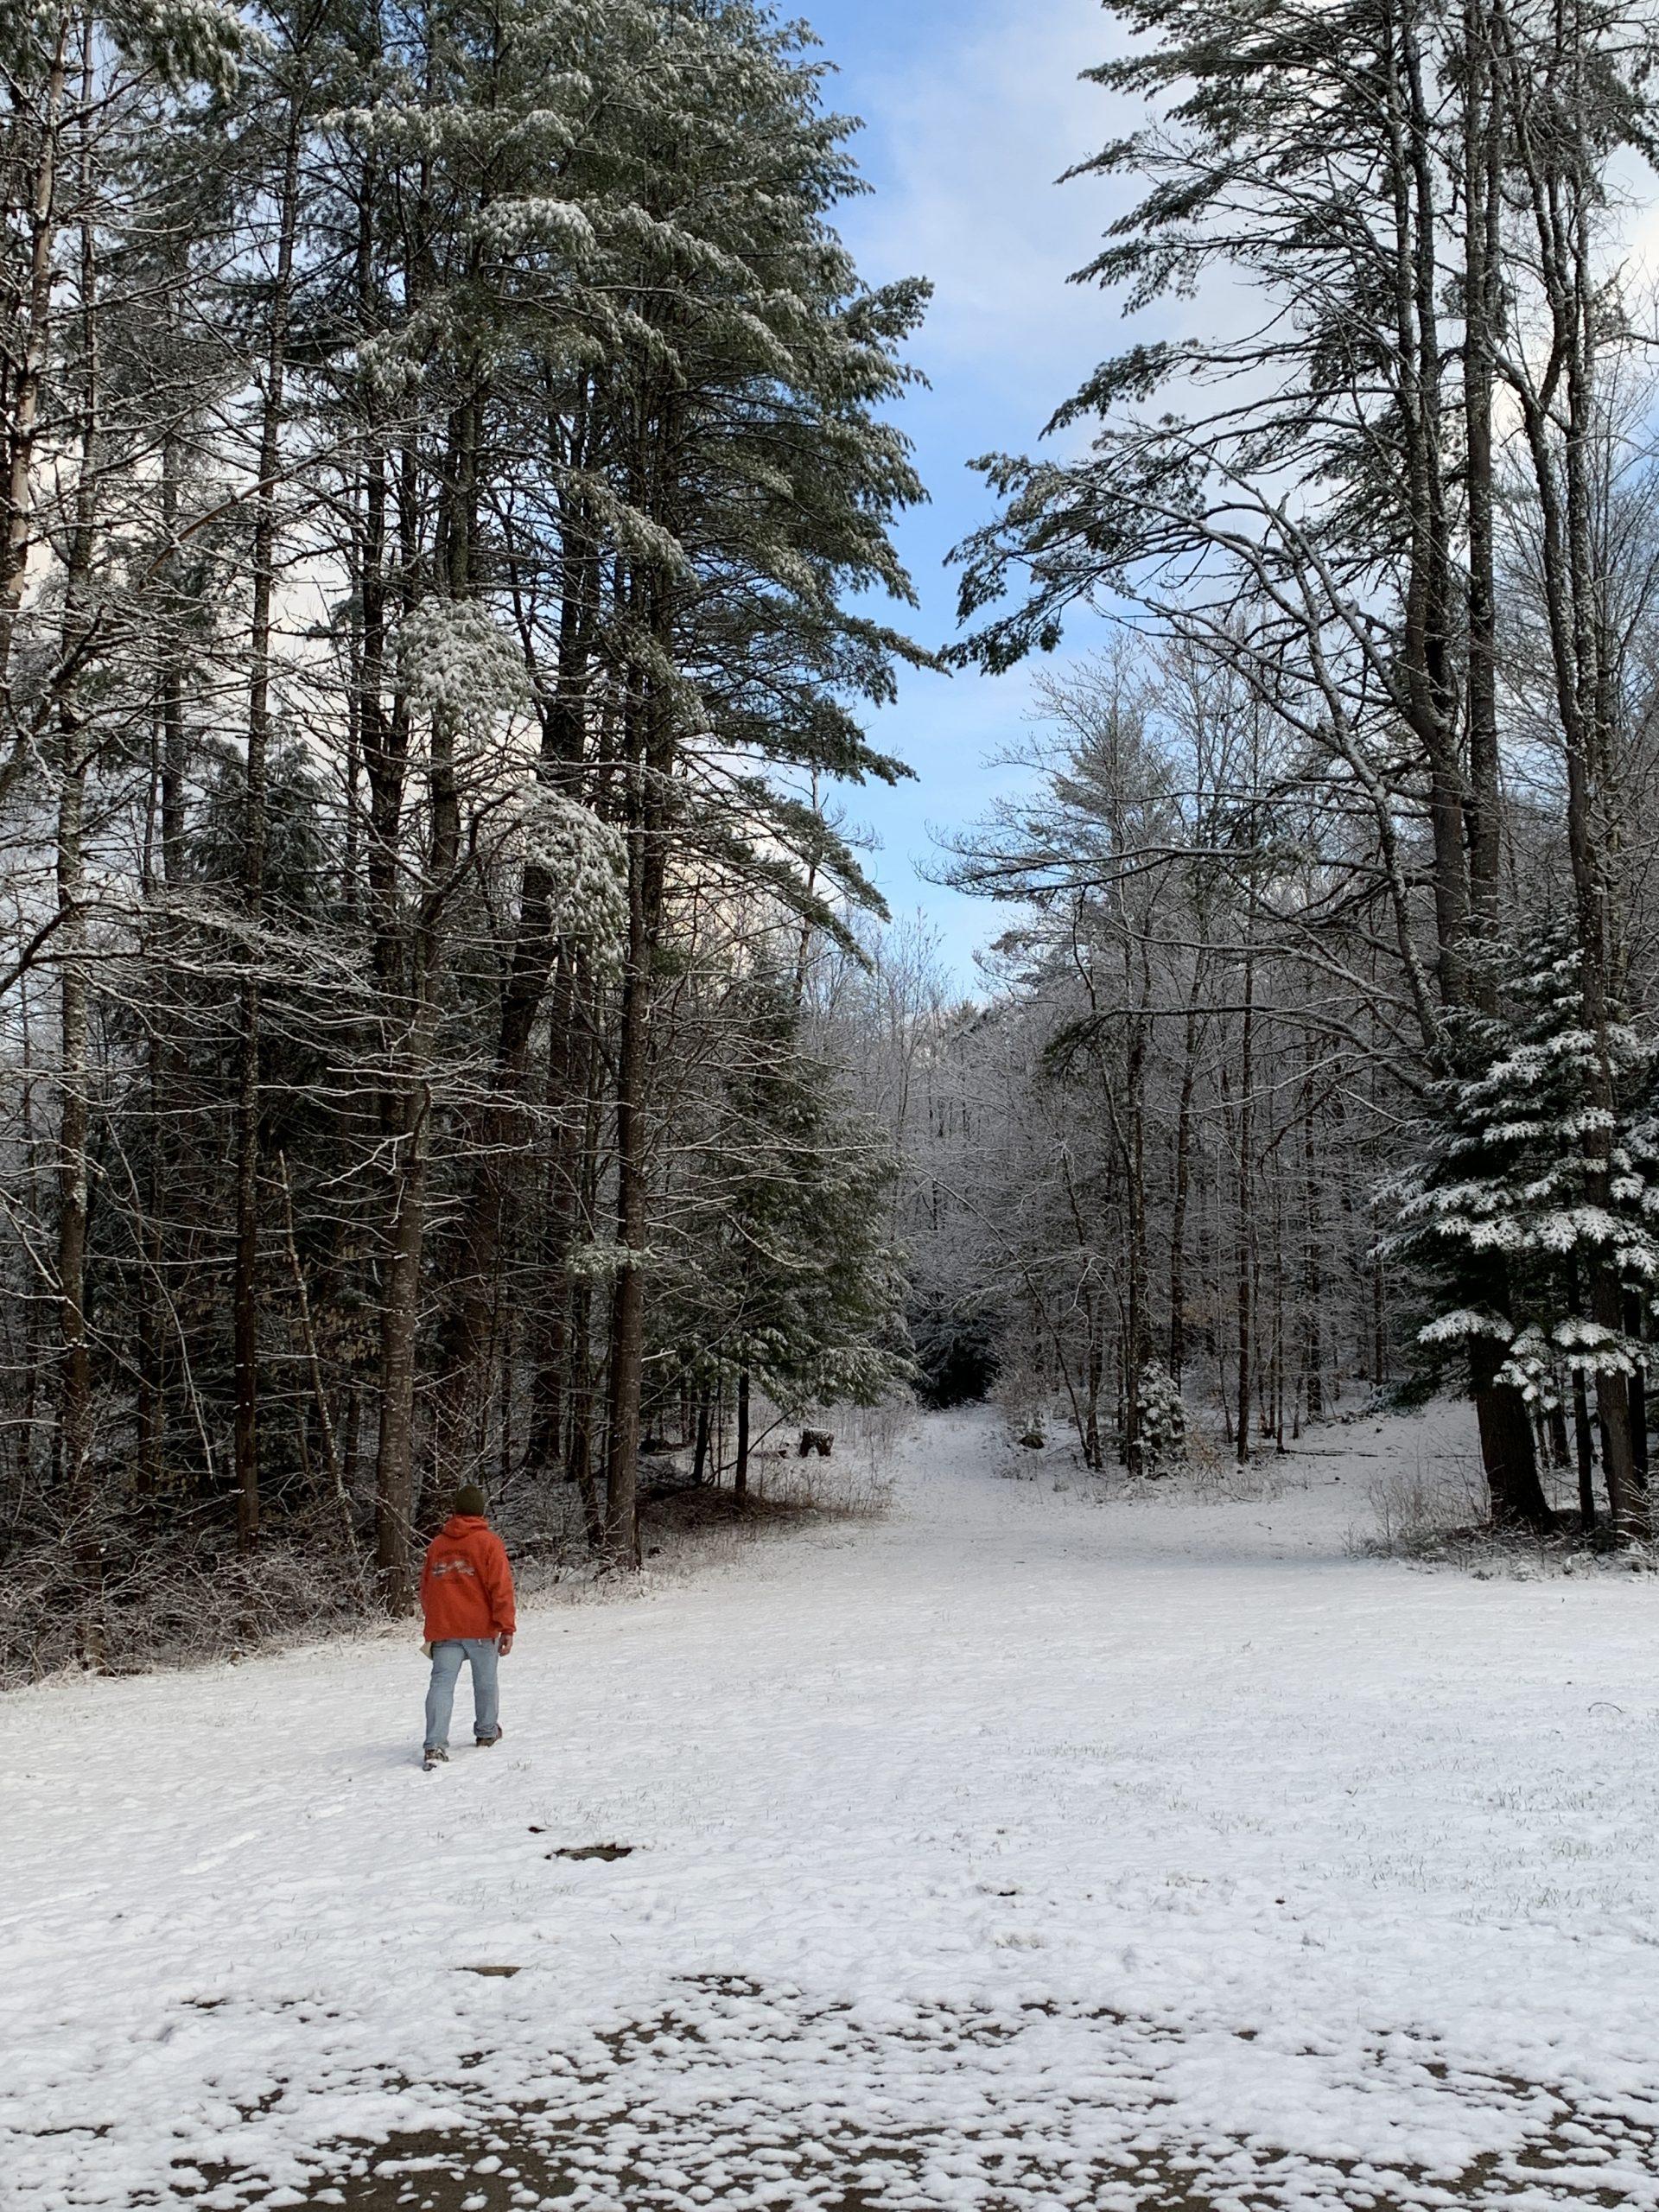 Walking Snowy Trail